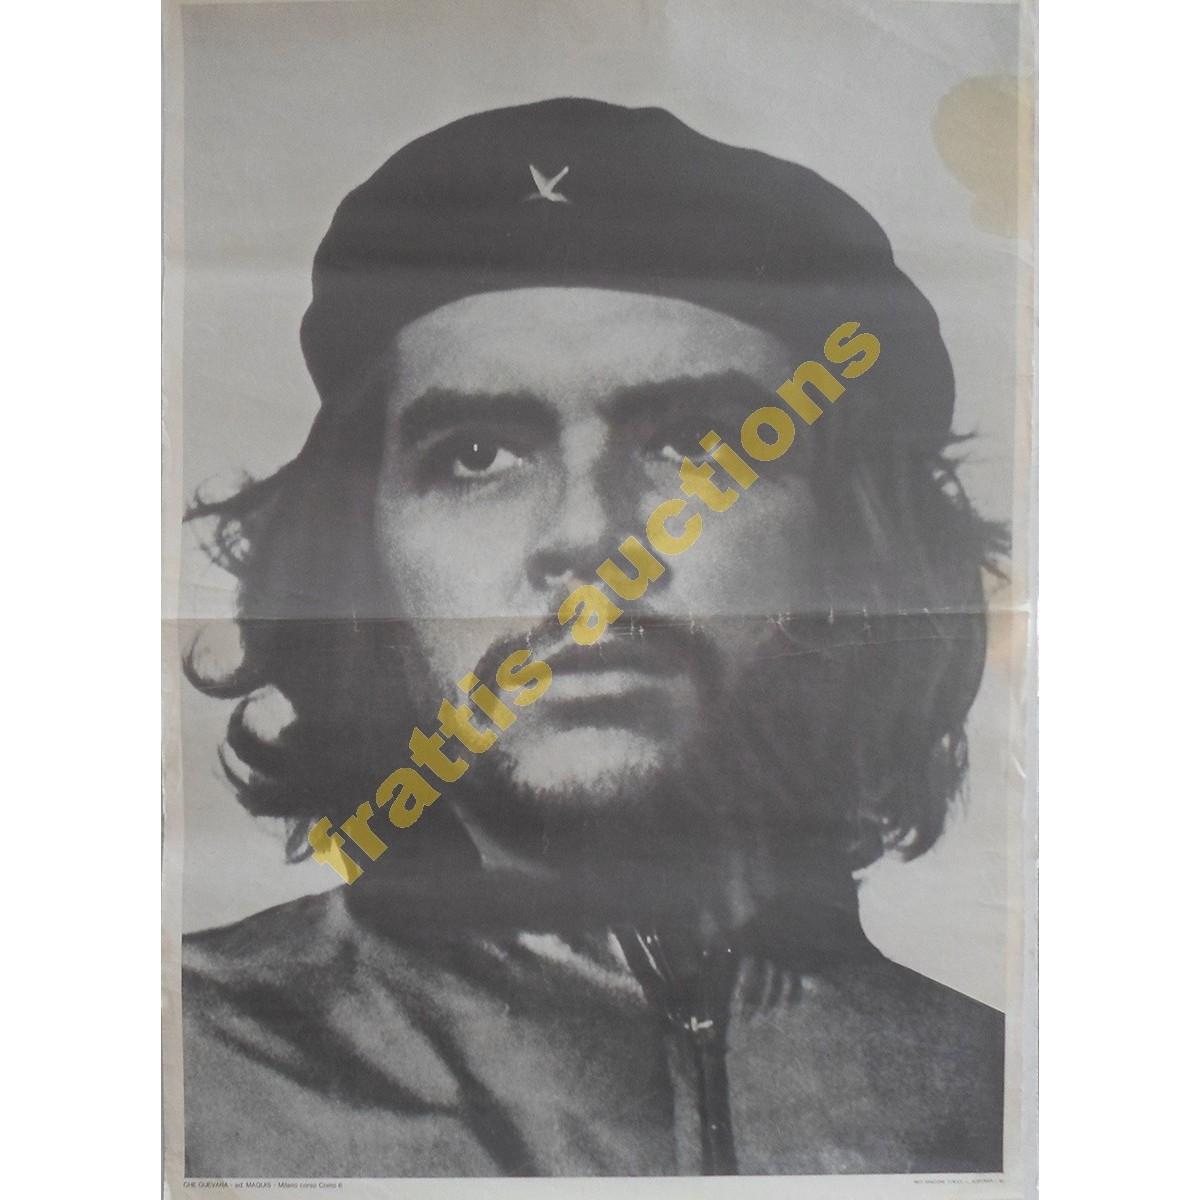 Che Guevara, χάρτινη αφίσα.